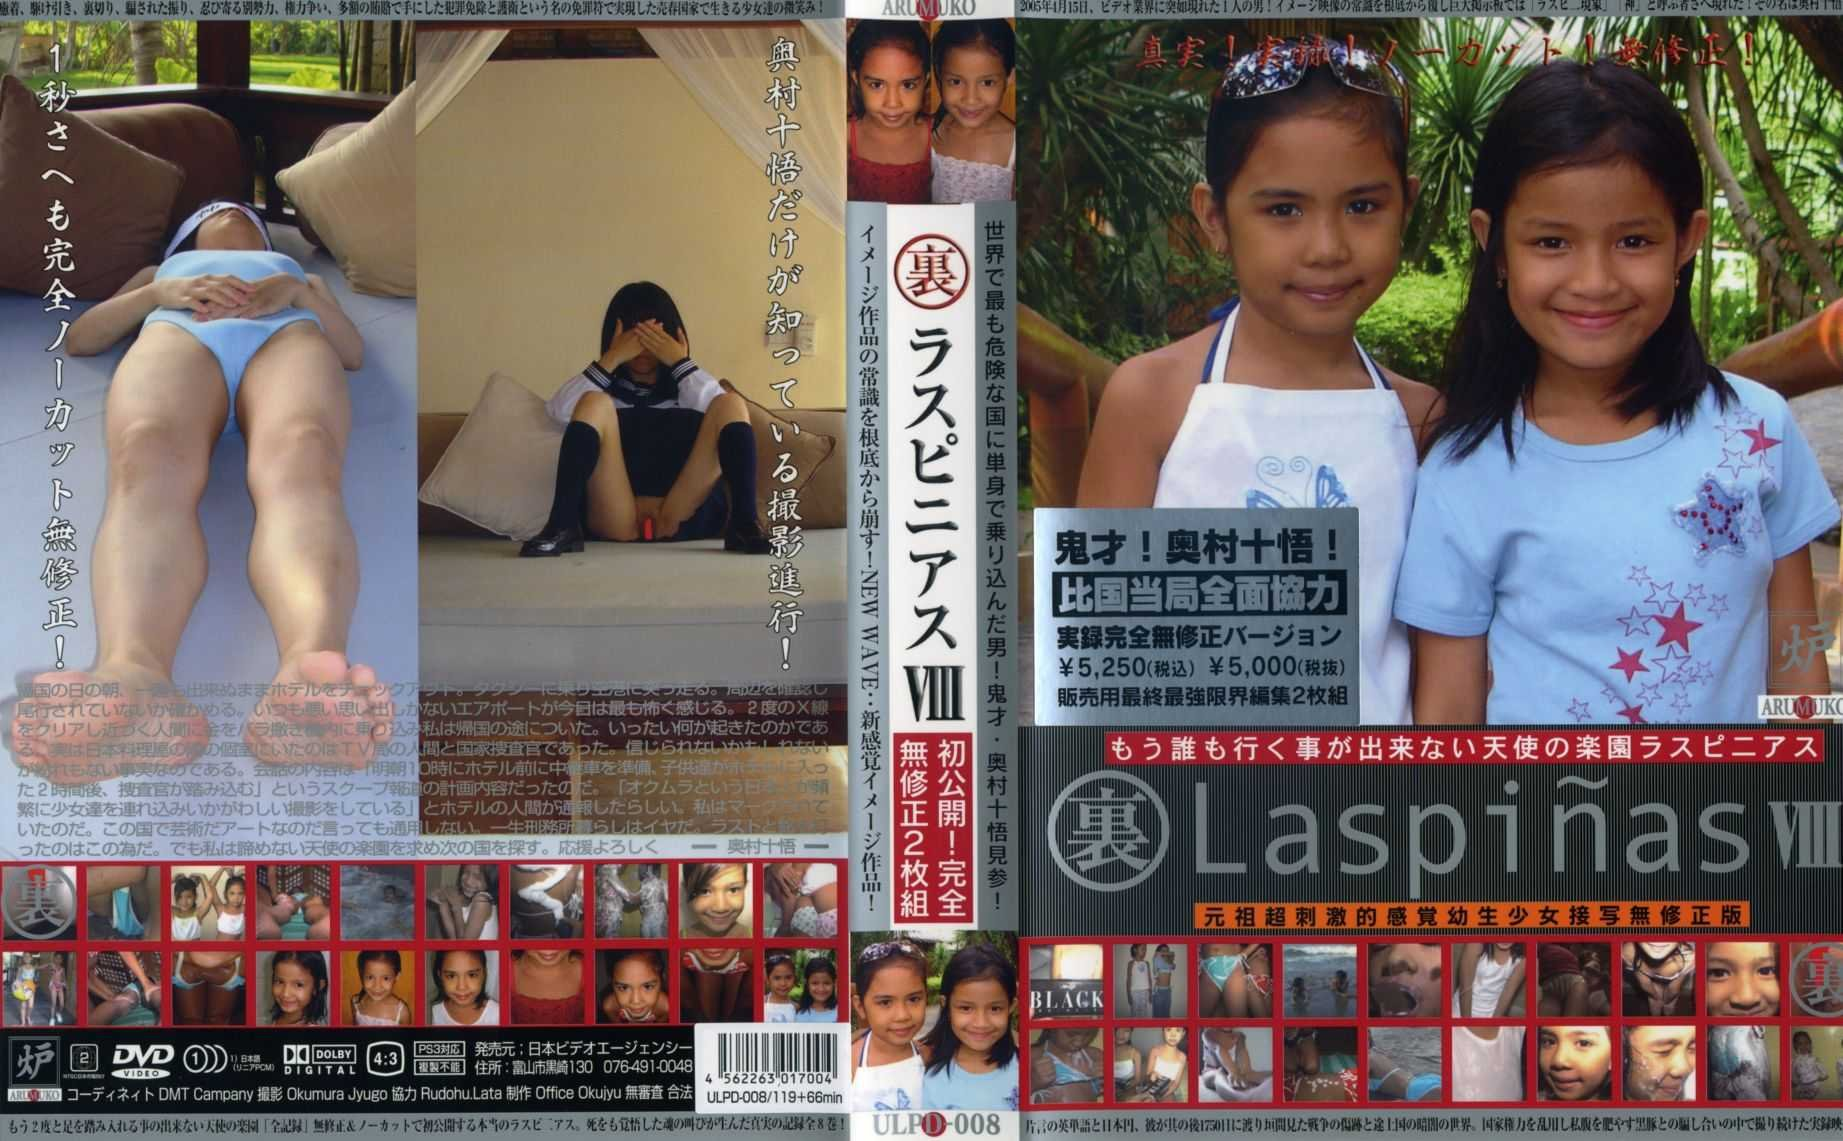 Laspiñas Ⅷ - Marika Tachibana